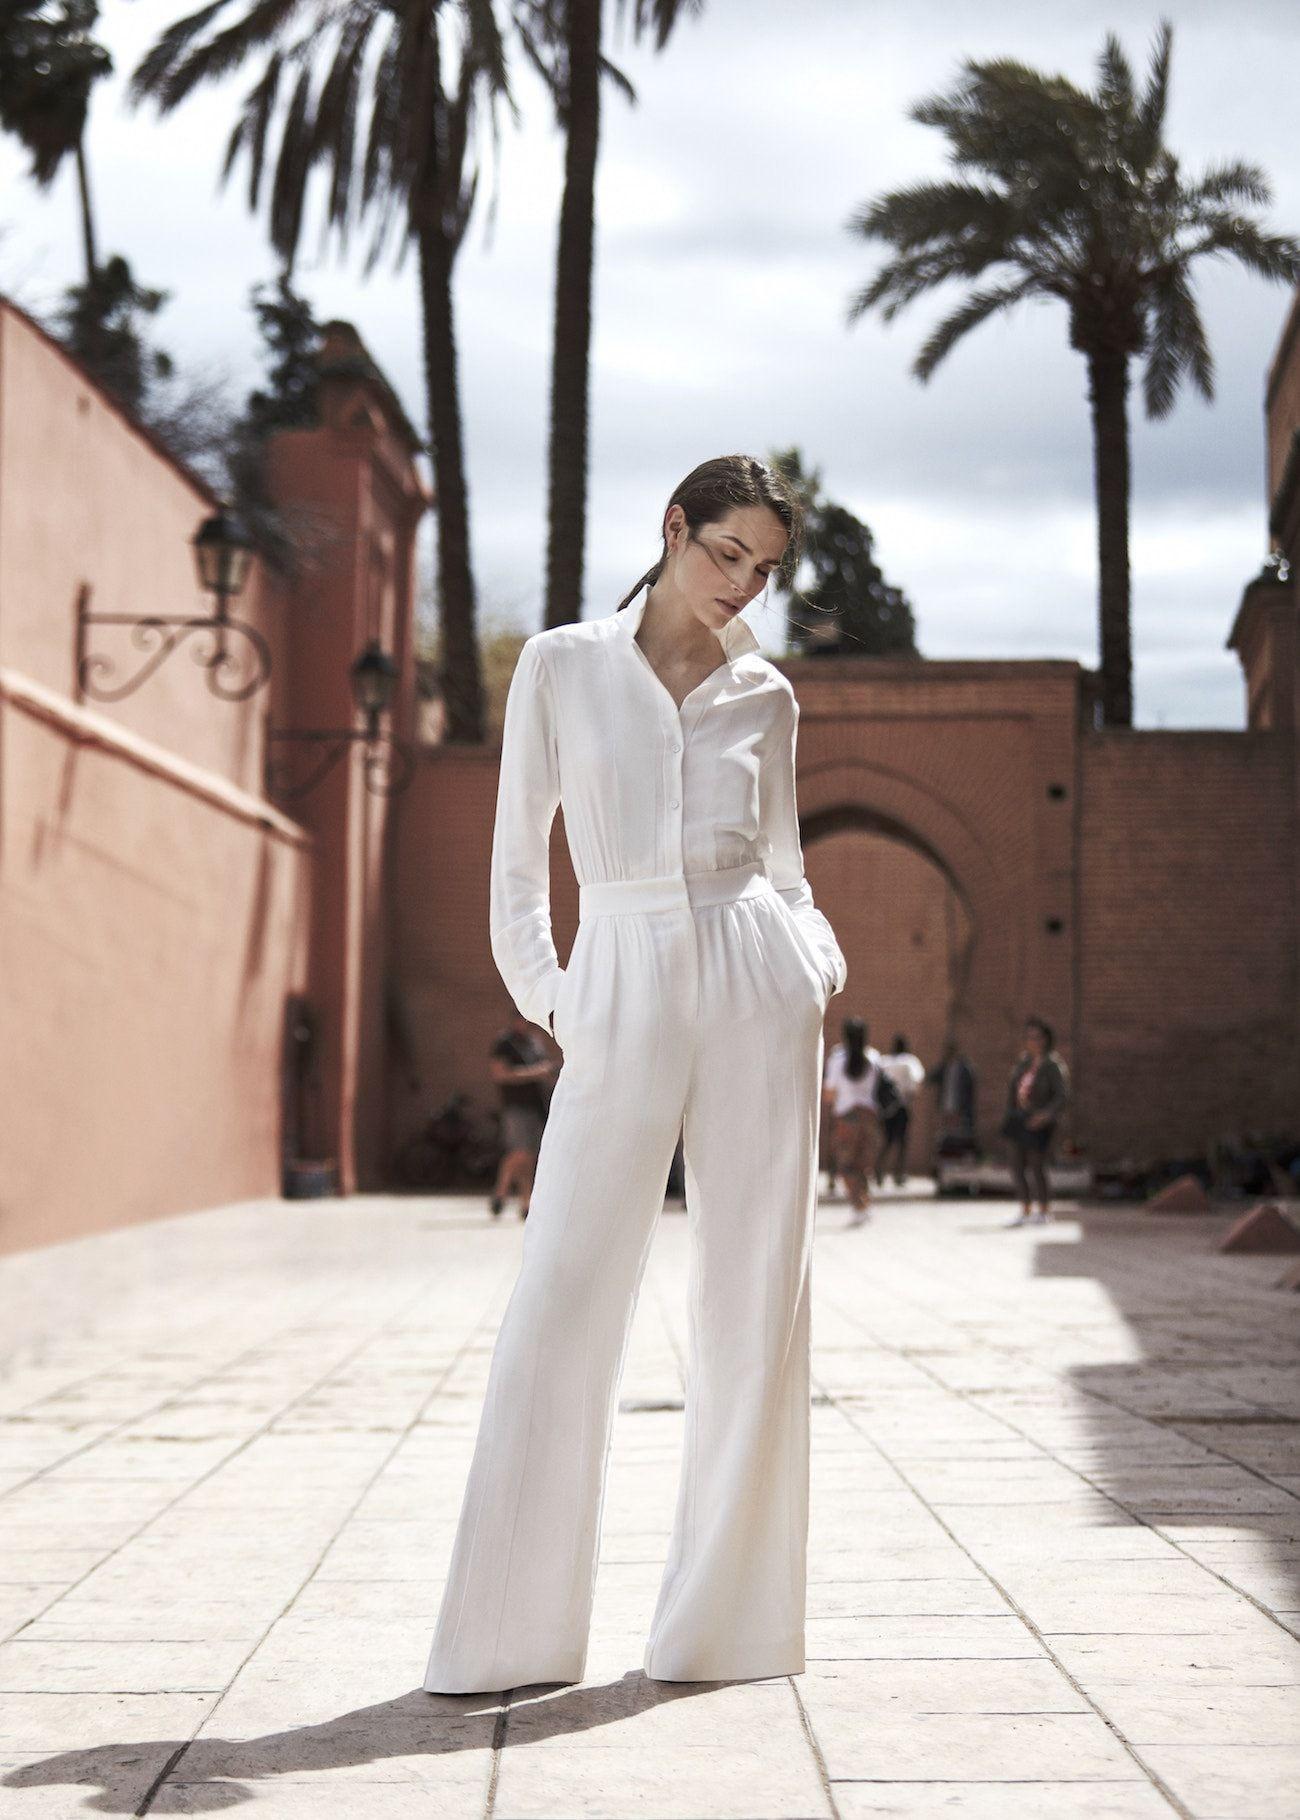 0d91b7b9553 Reiss Juno Wide-leg Jumpsuit Wedding Guest Outfit